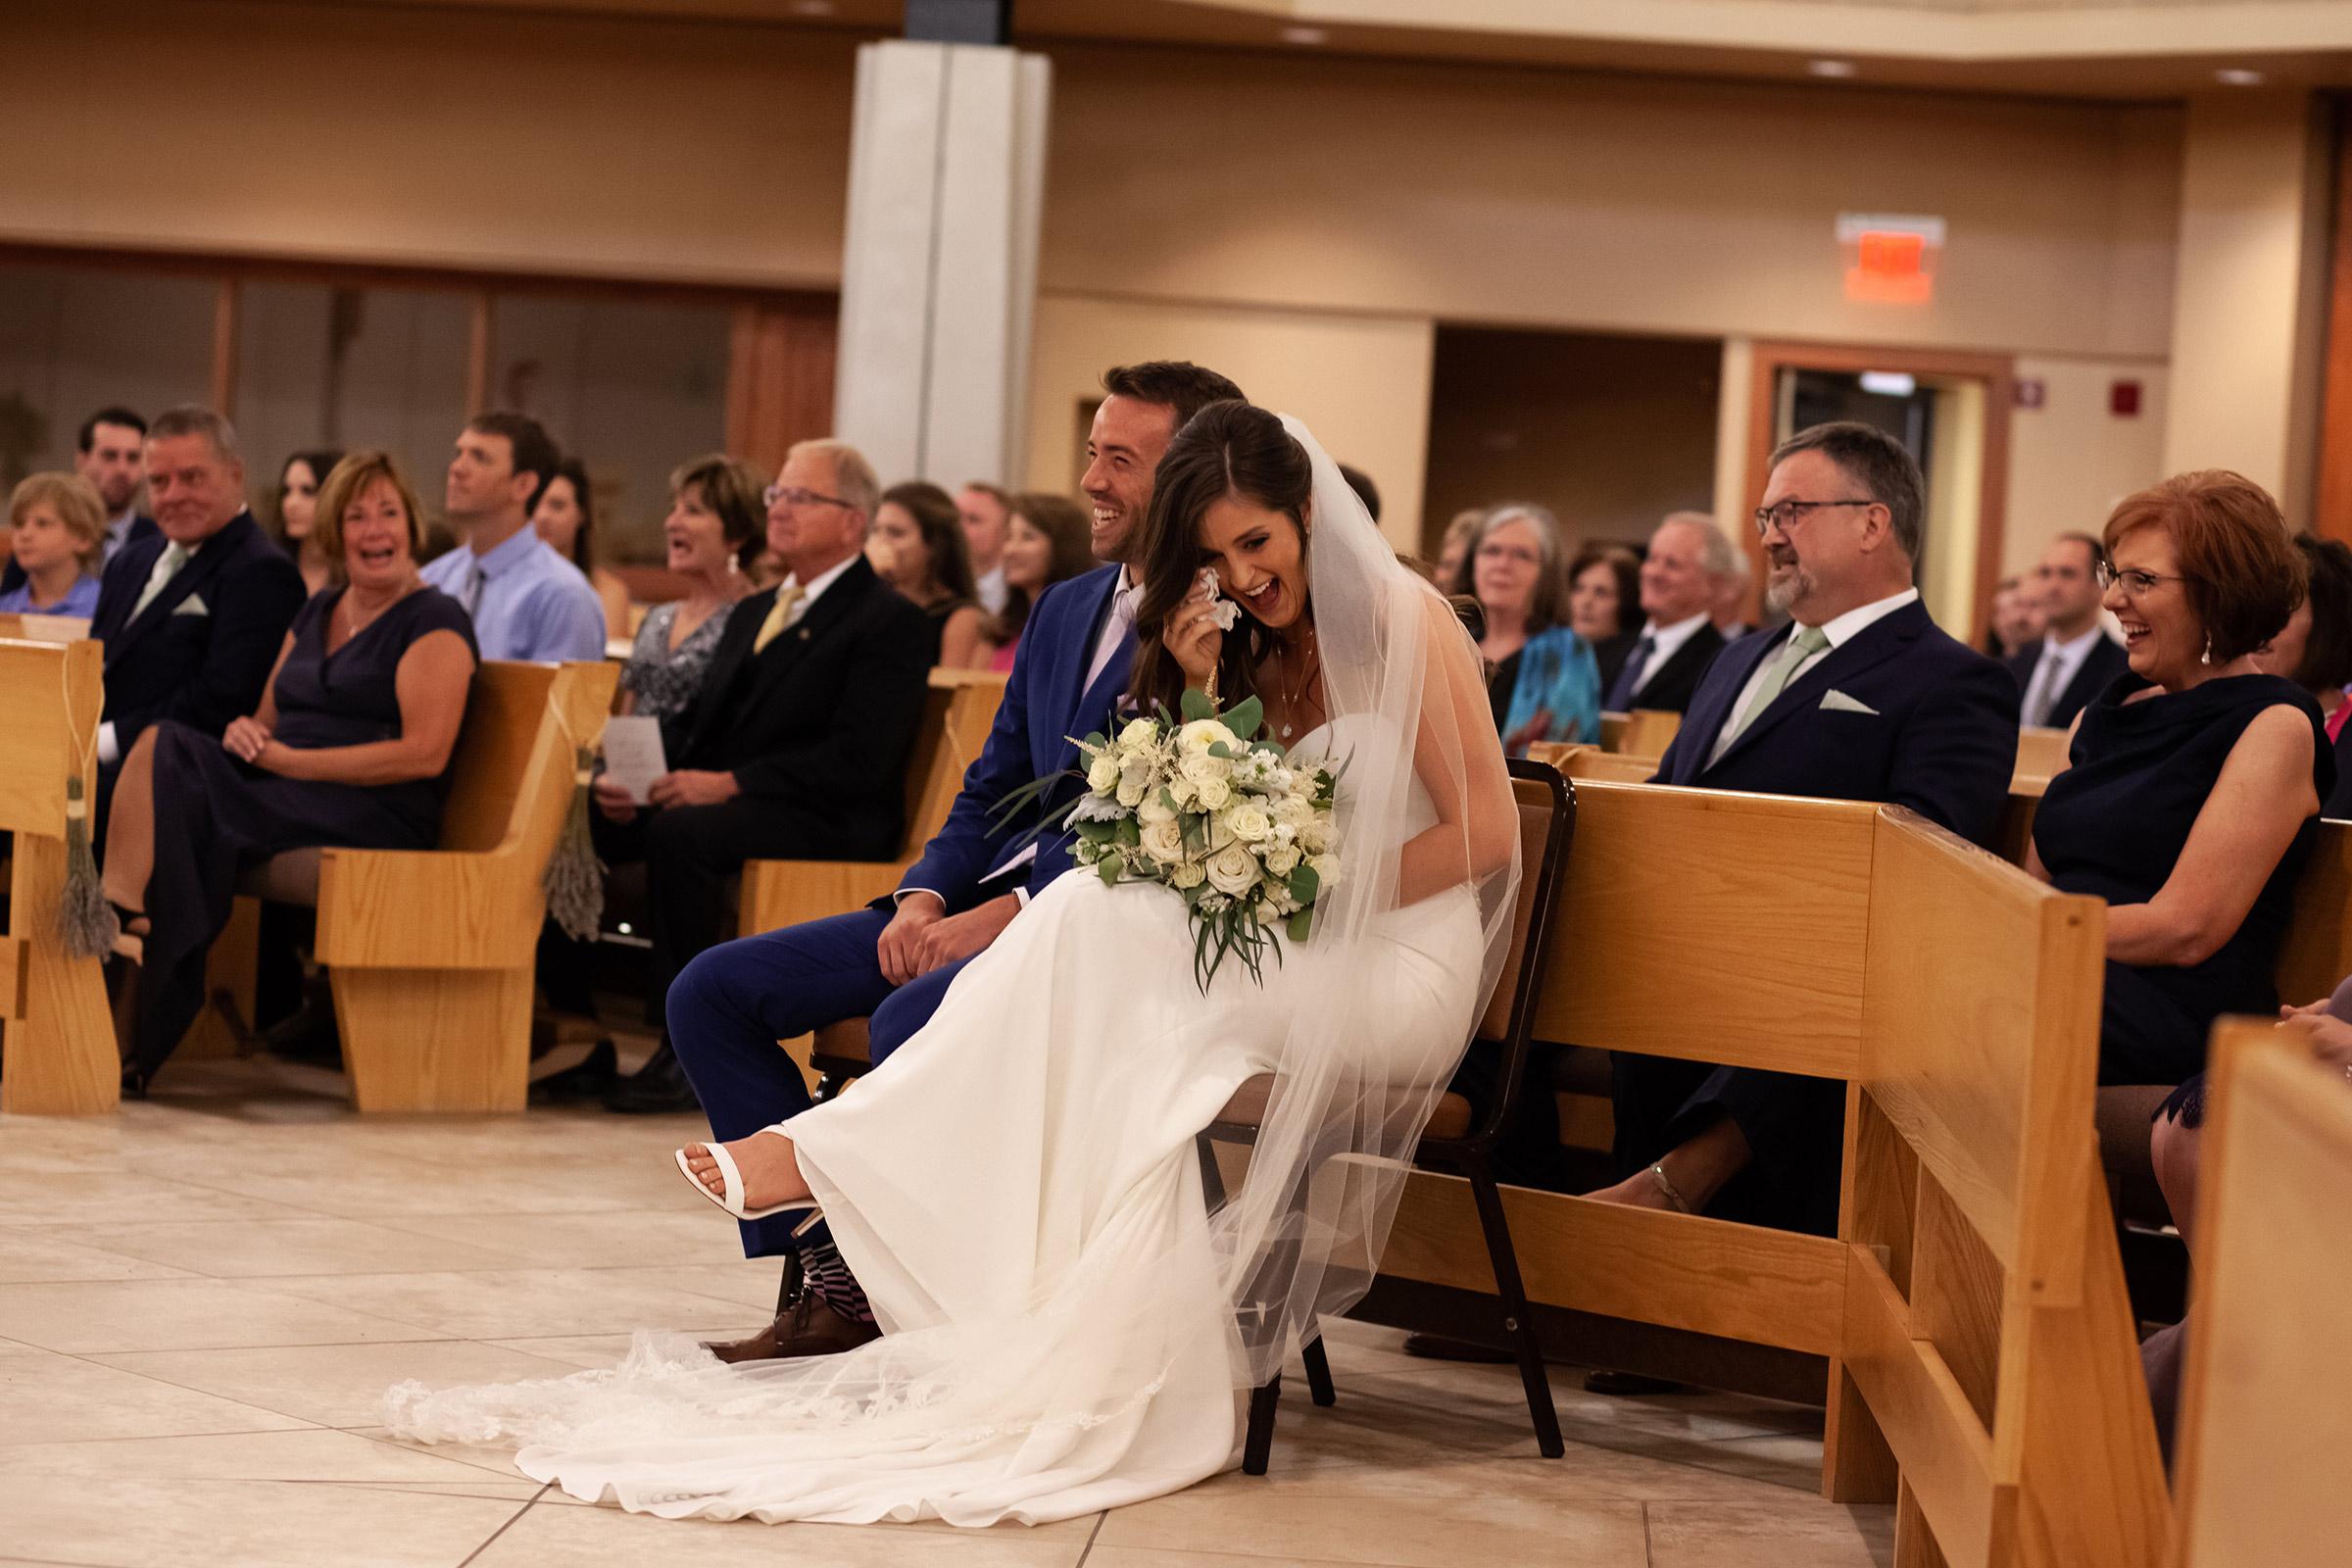 mr-mrs-hull-bride-groom-laughing-ceremony-st-boniface-church-waukee-desmoines-iowa-raelyn-ramey-photography-328.jpg